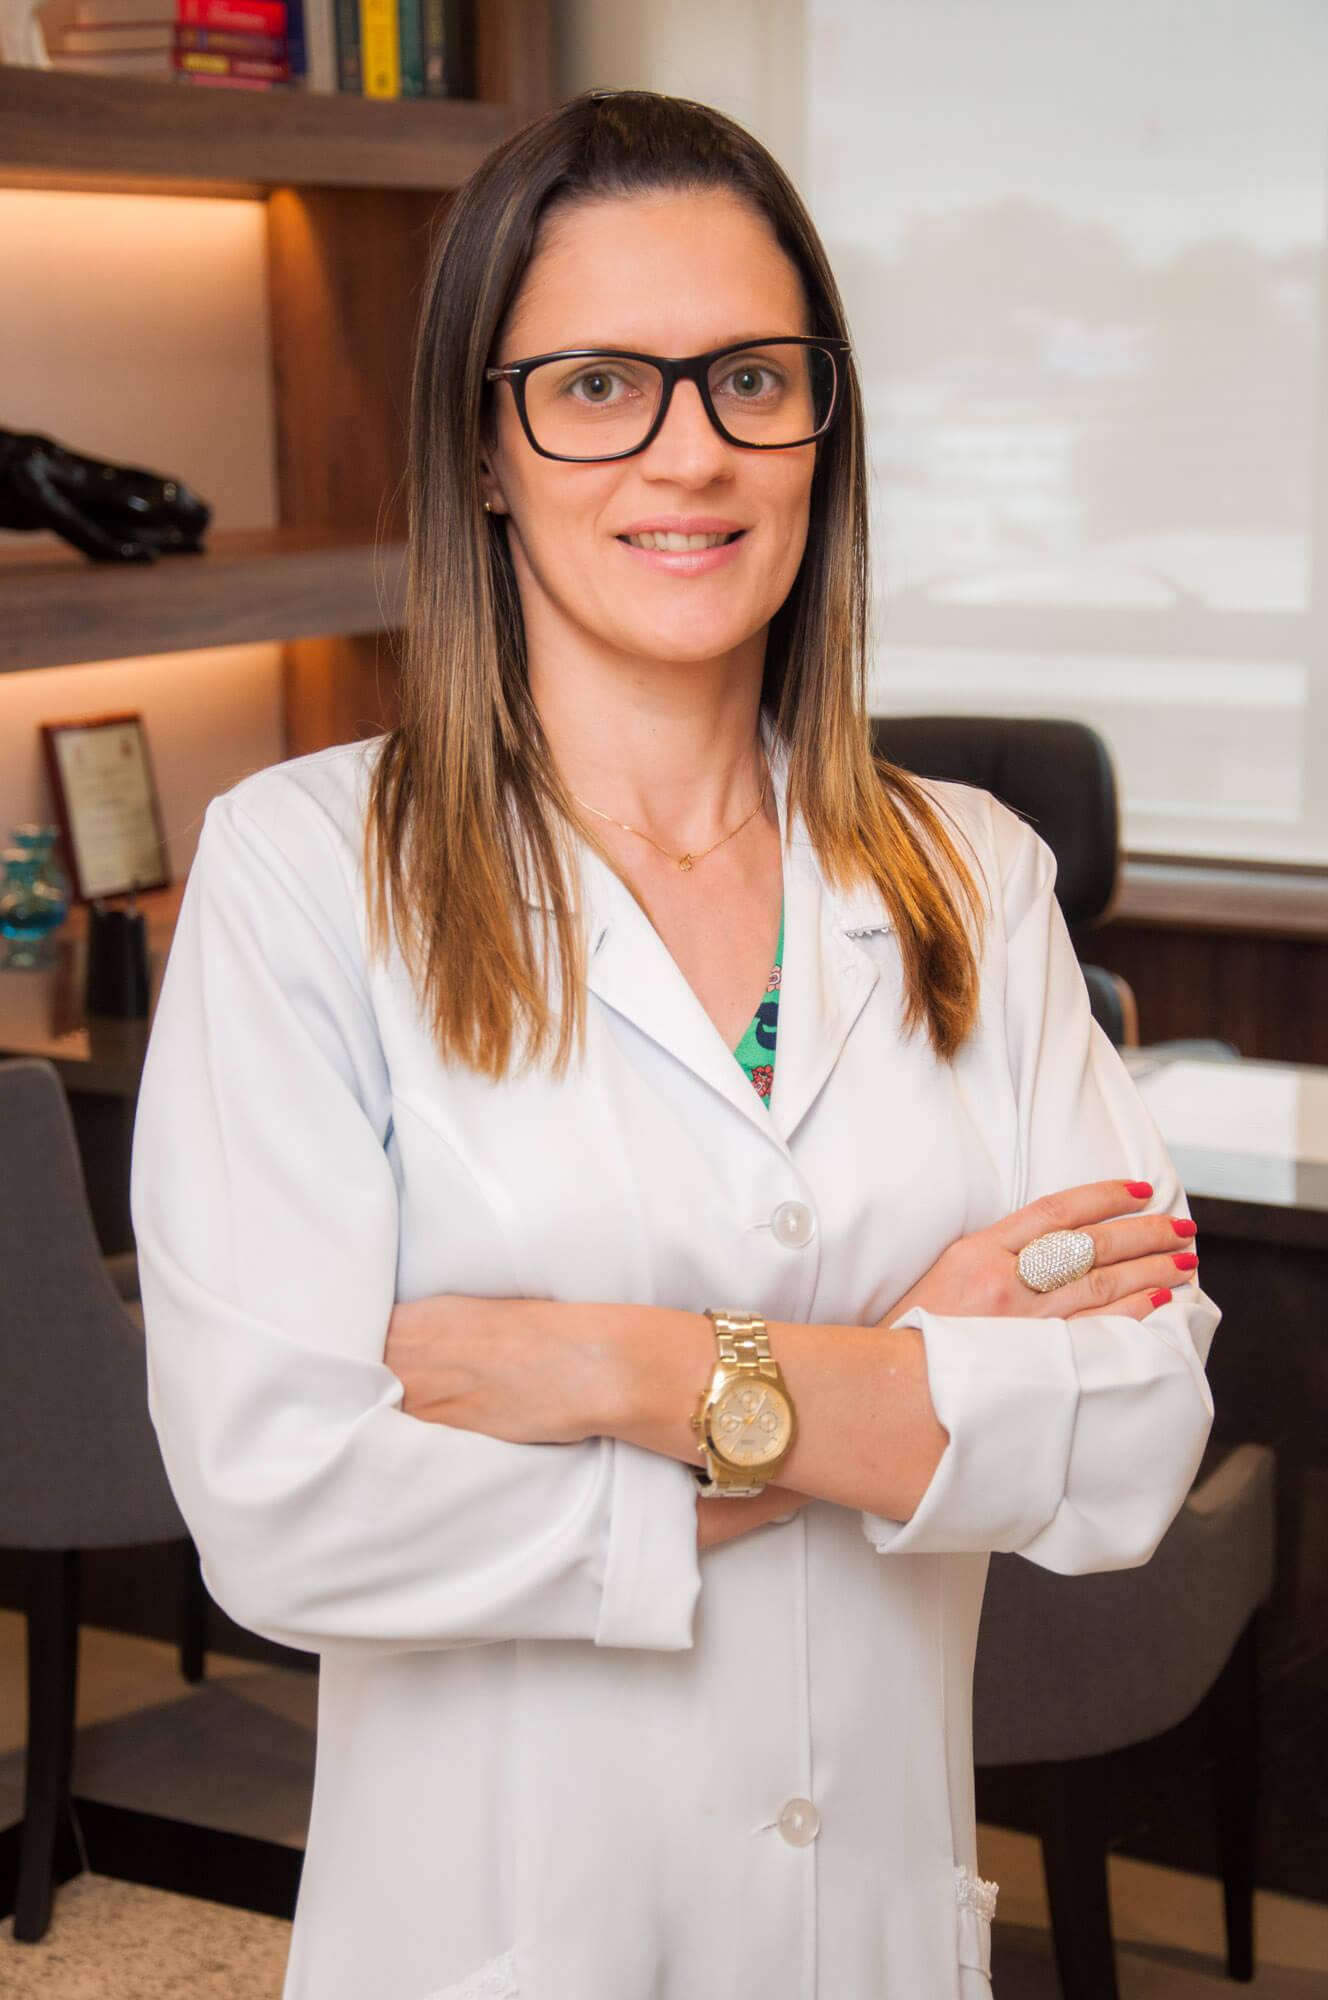 FDS_Clinica-DR-Alcides-Branco_180308_058